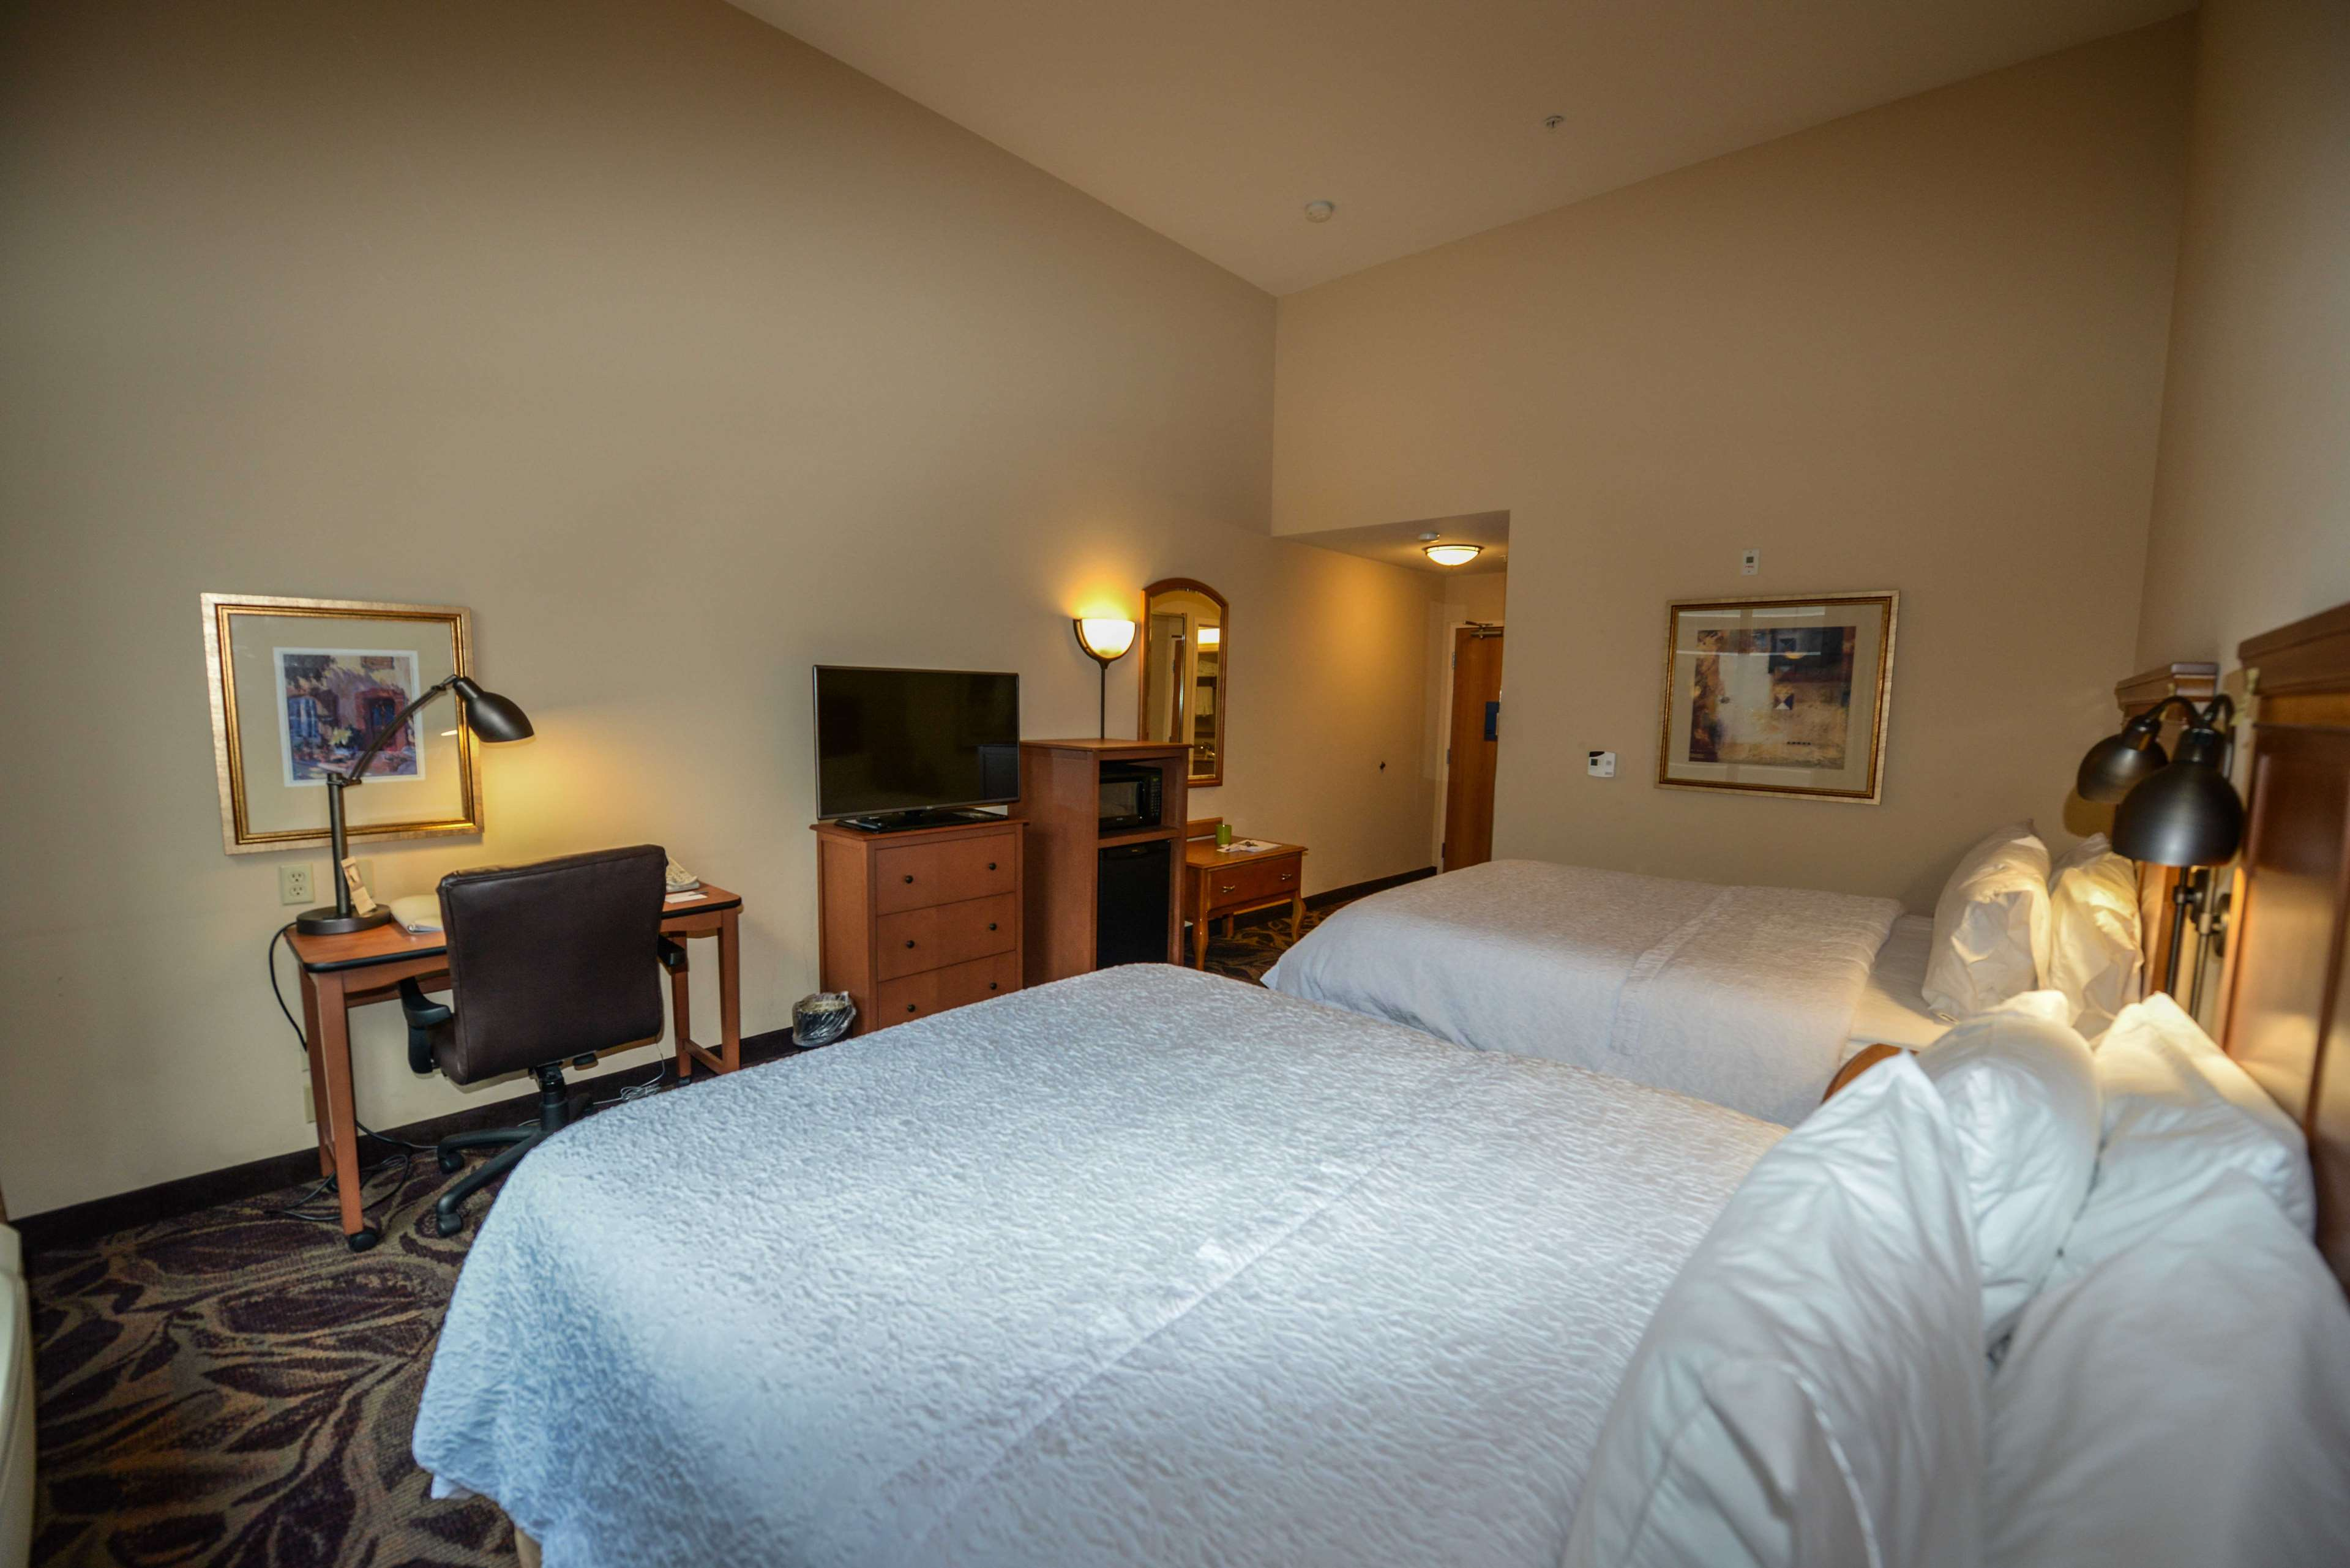 Hampton Inn & Suites Bremerton image 35